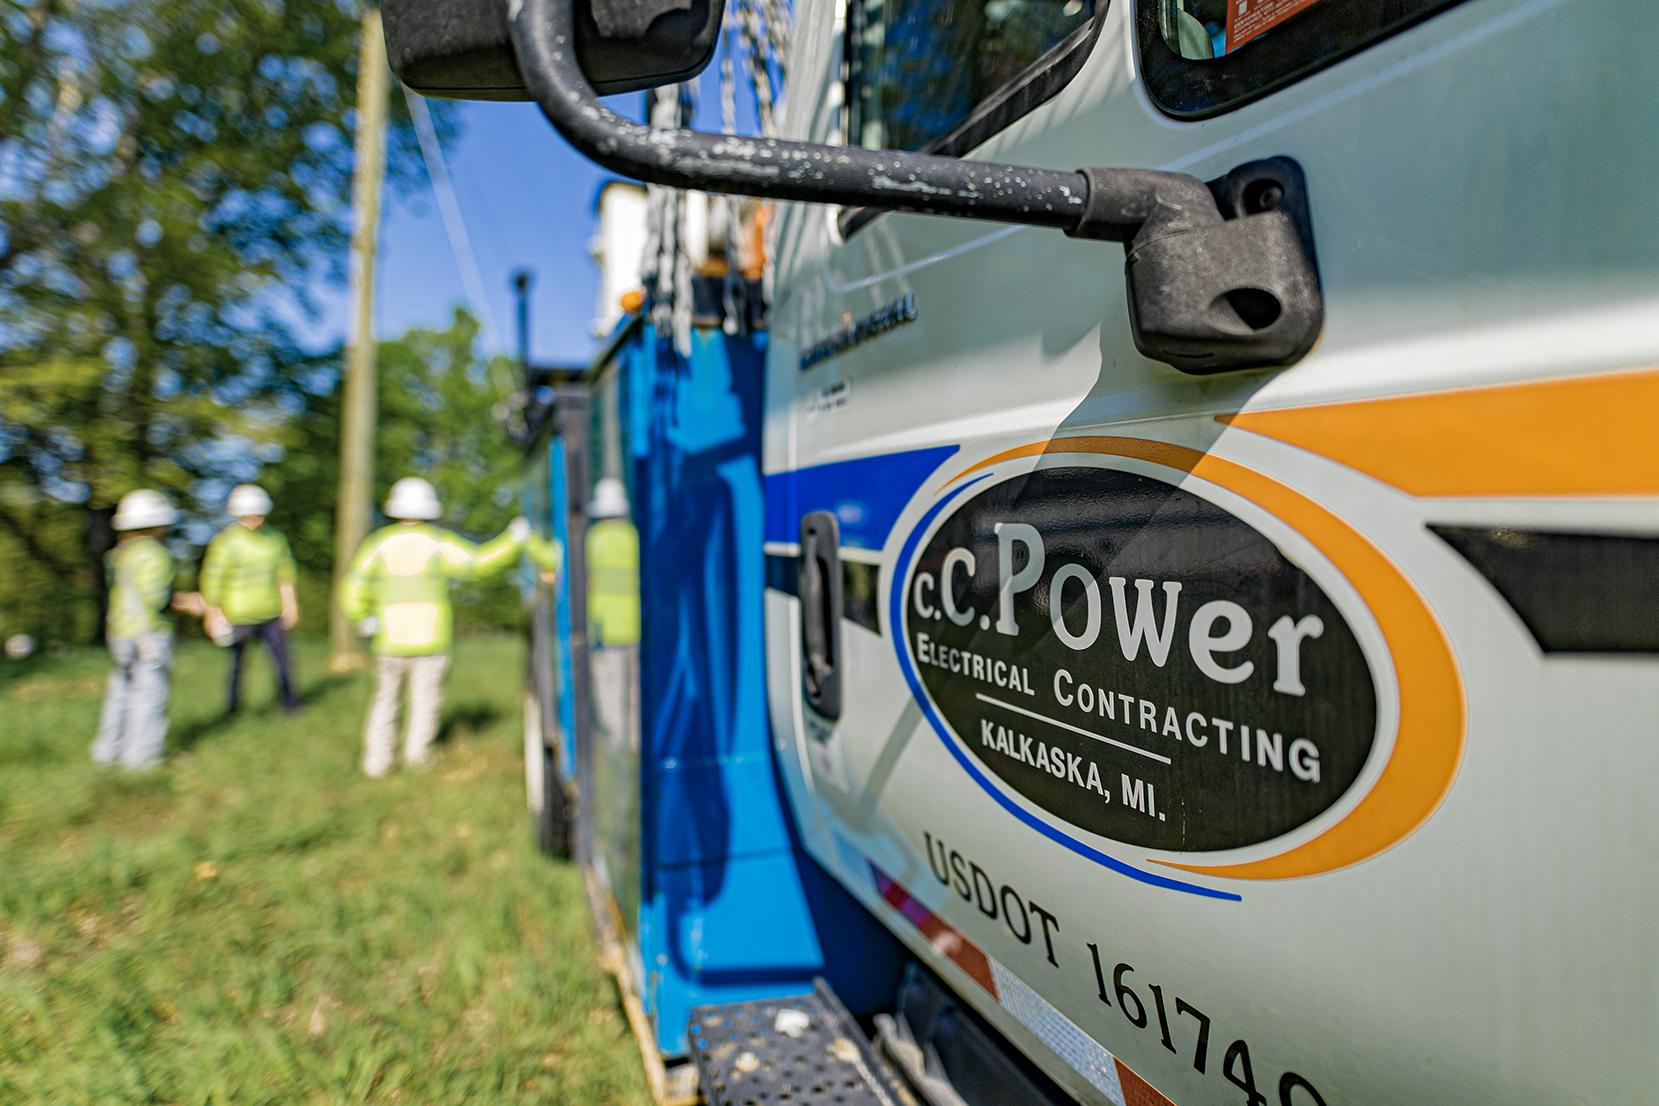 underground electrical contractors